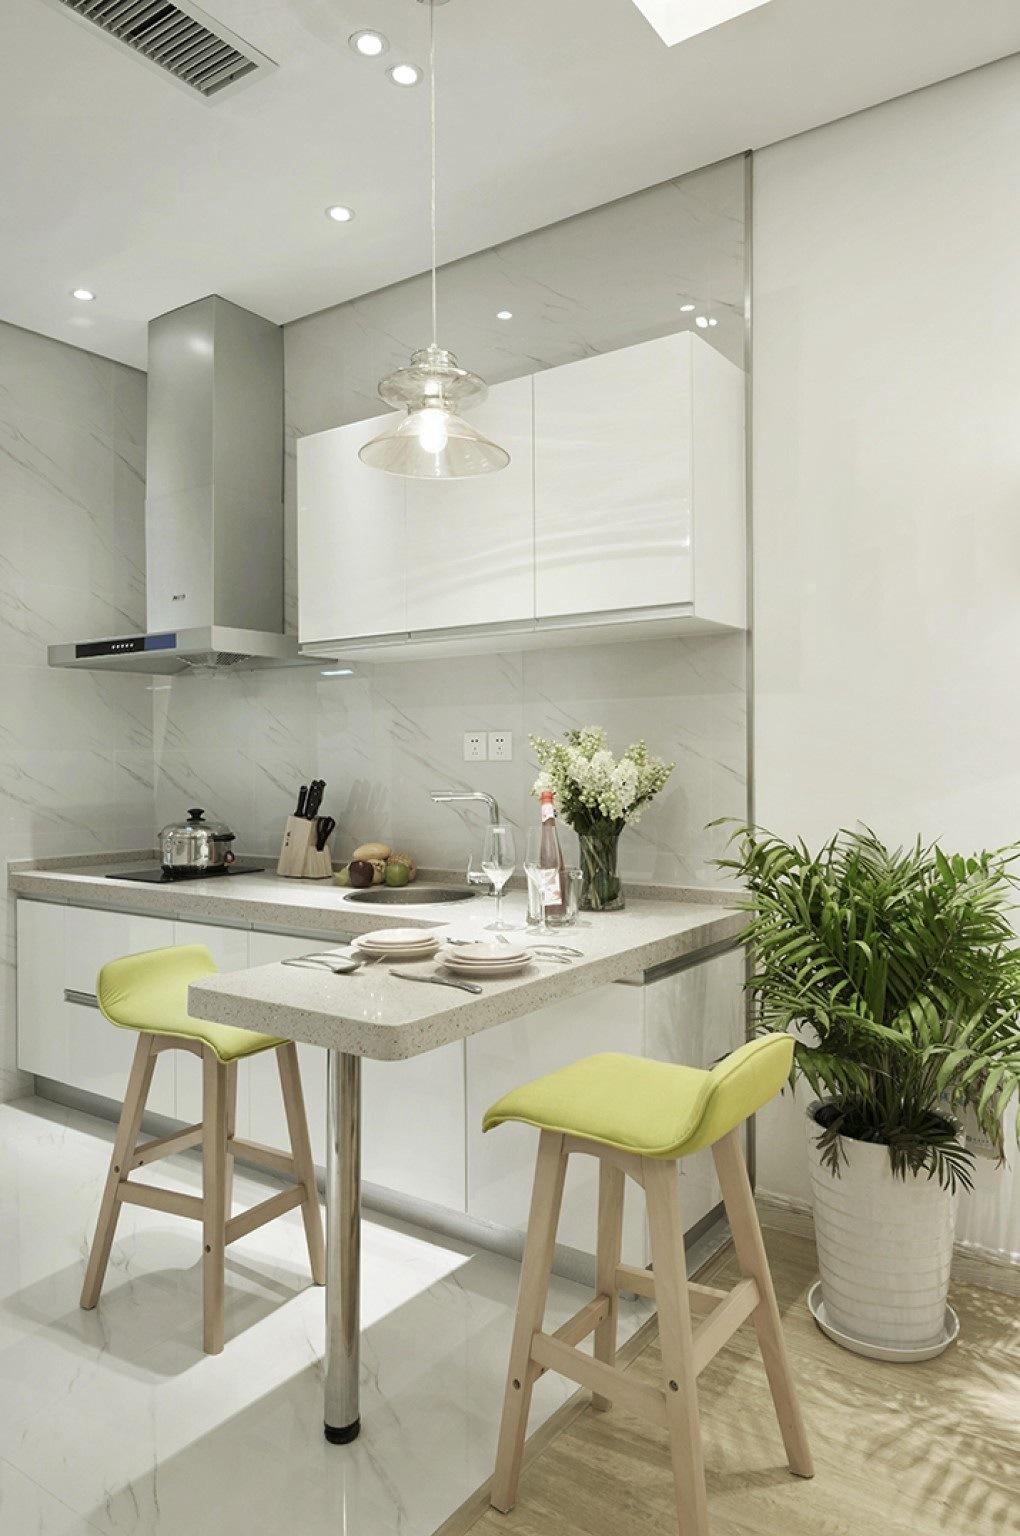 China High Gloss White Lacquer Small Grey Stone Kitchen Acs2 L394